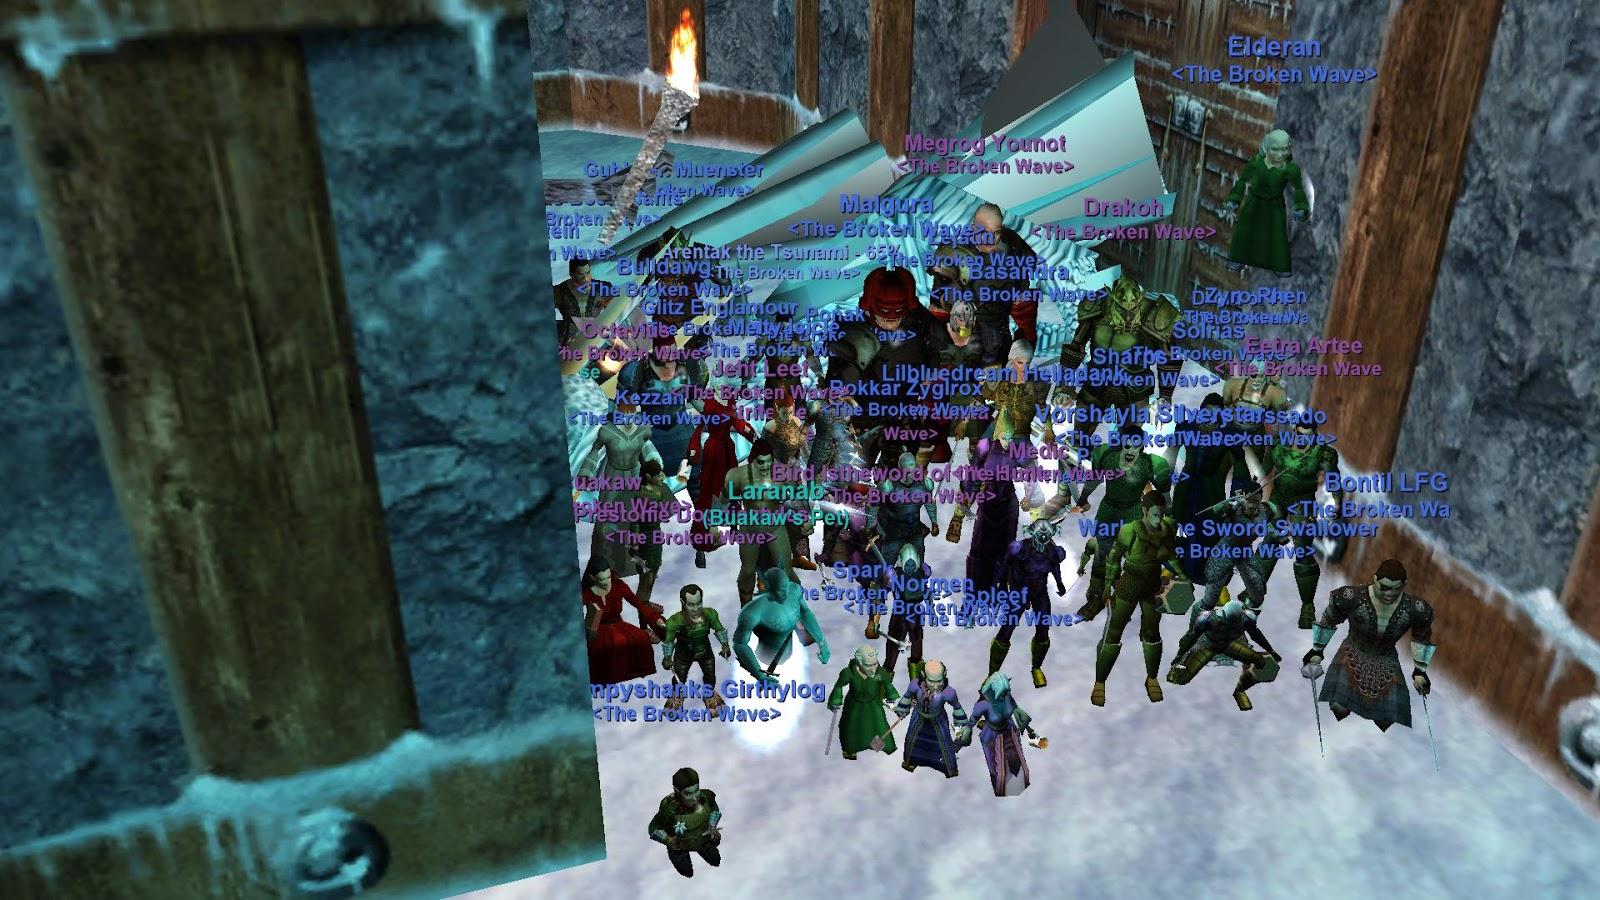 Arentak's Everquest Blog: Revenge! Vox down! Naggy down!